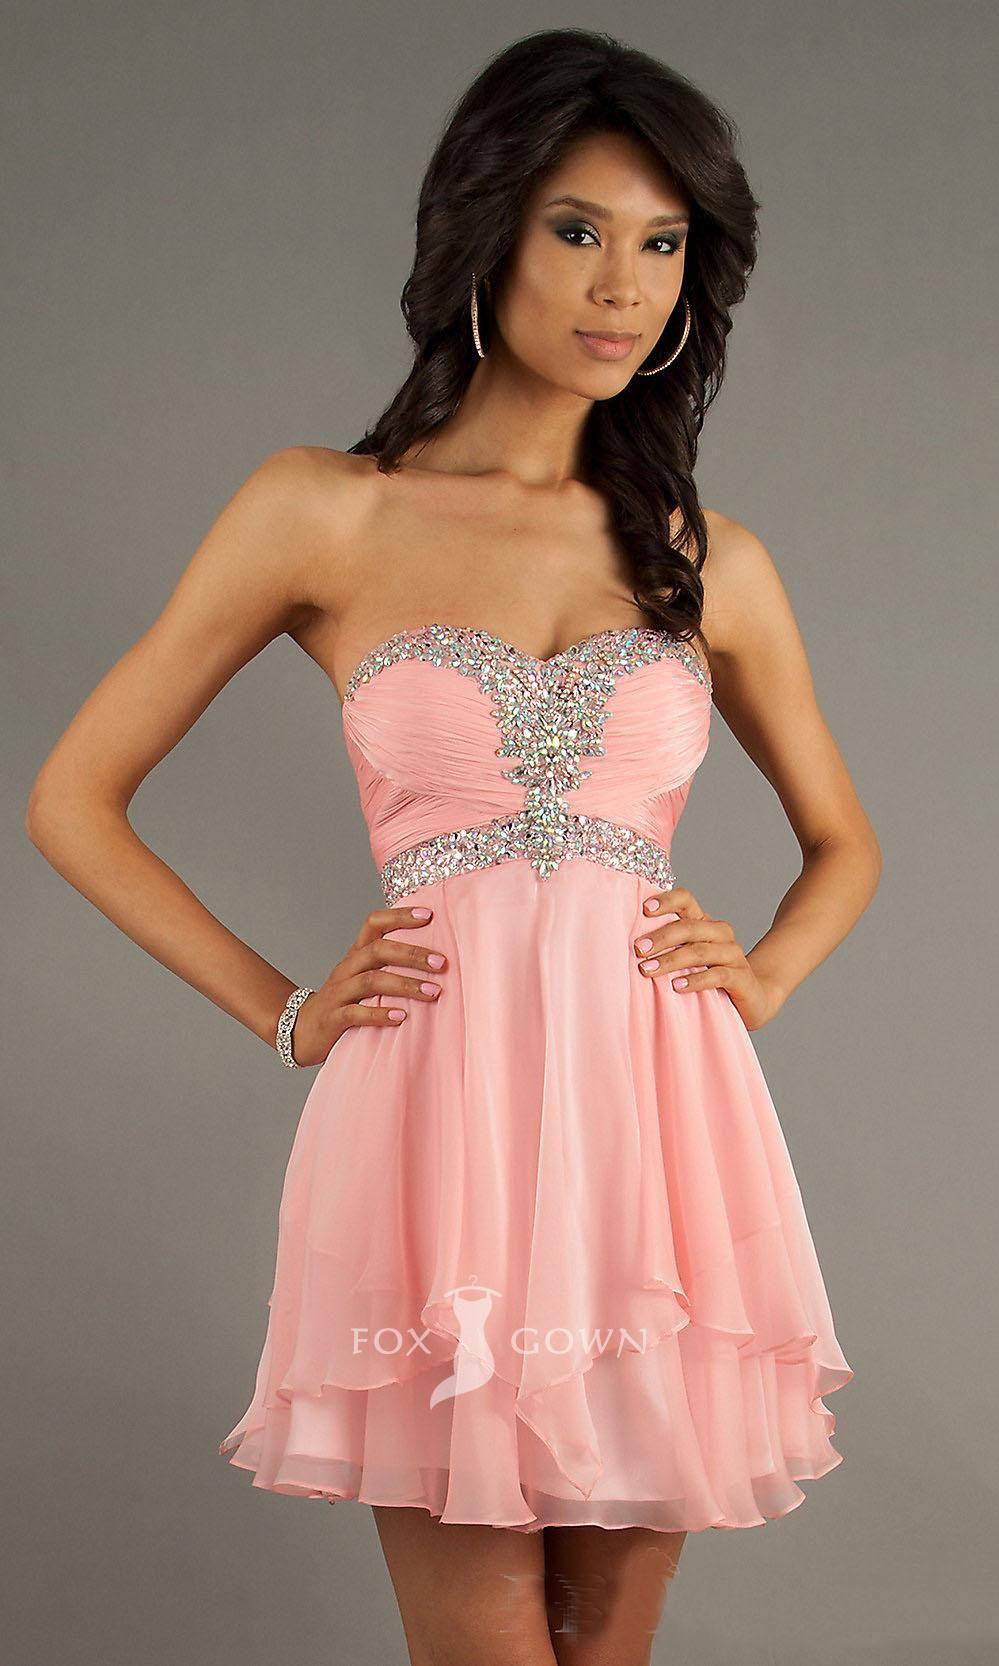 Pin de Lisaaa en Pretty dresses ❦ | Pinterest